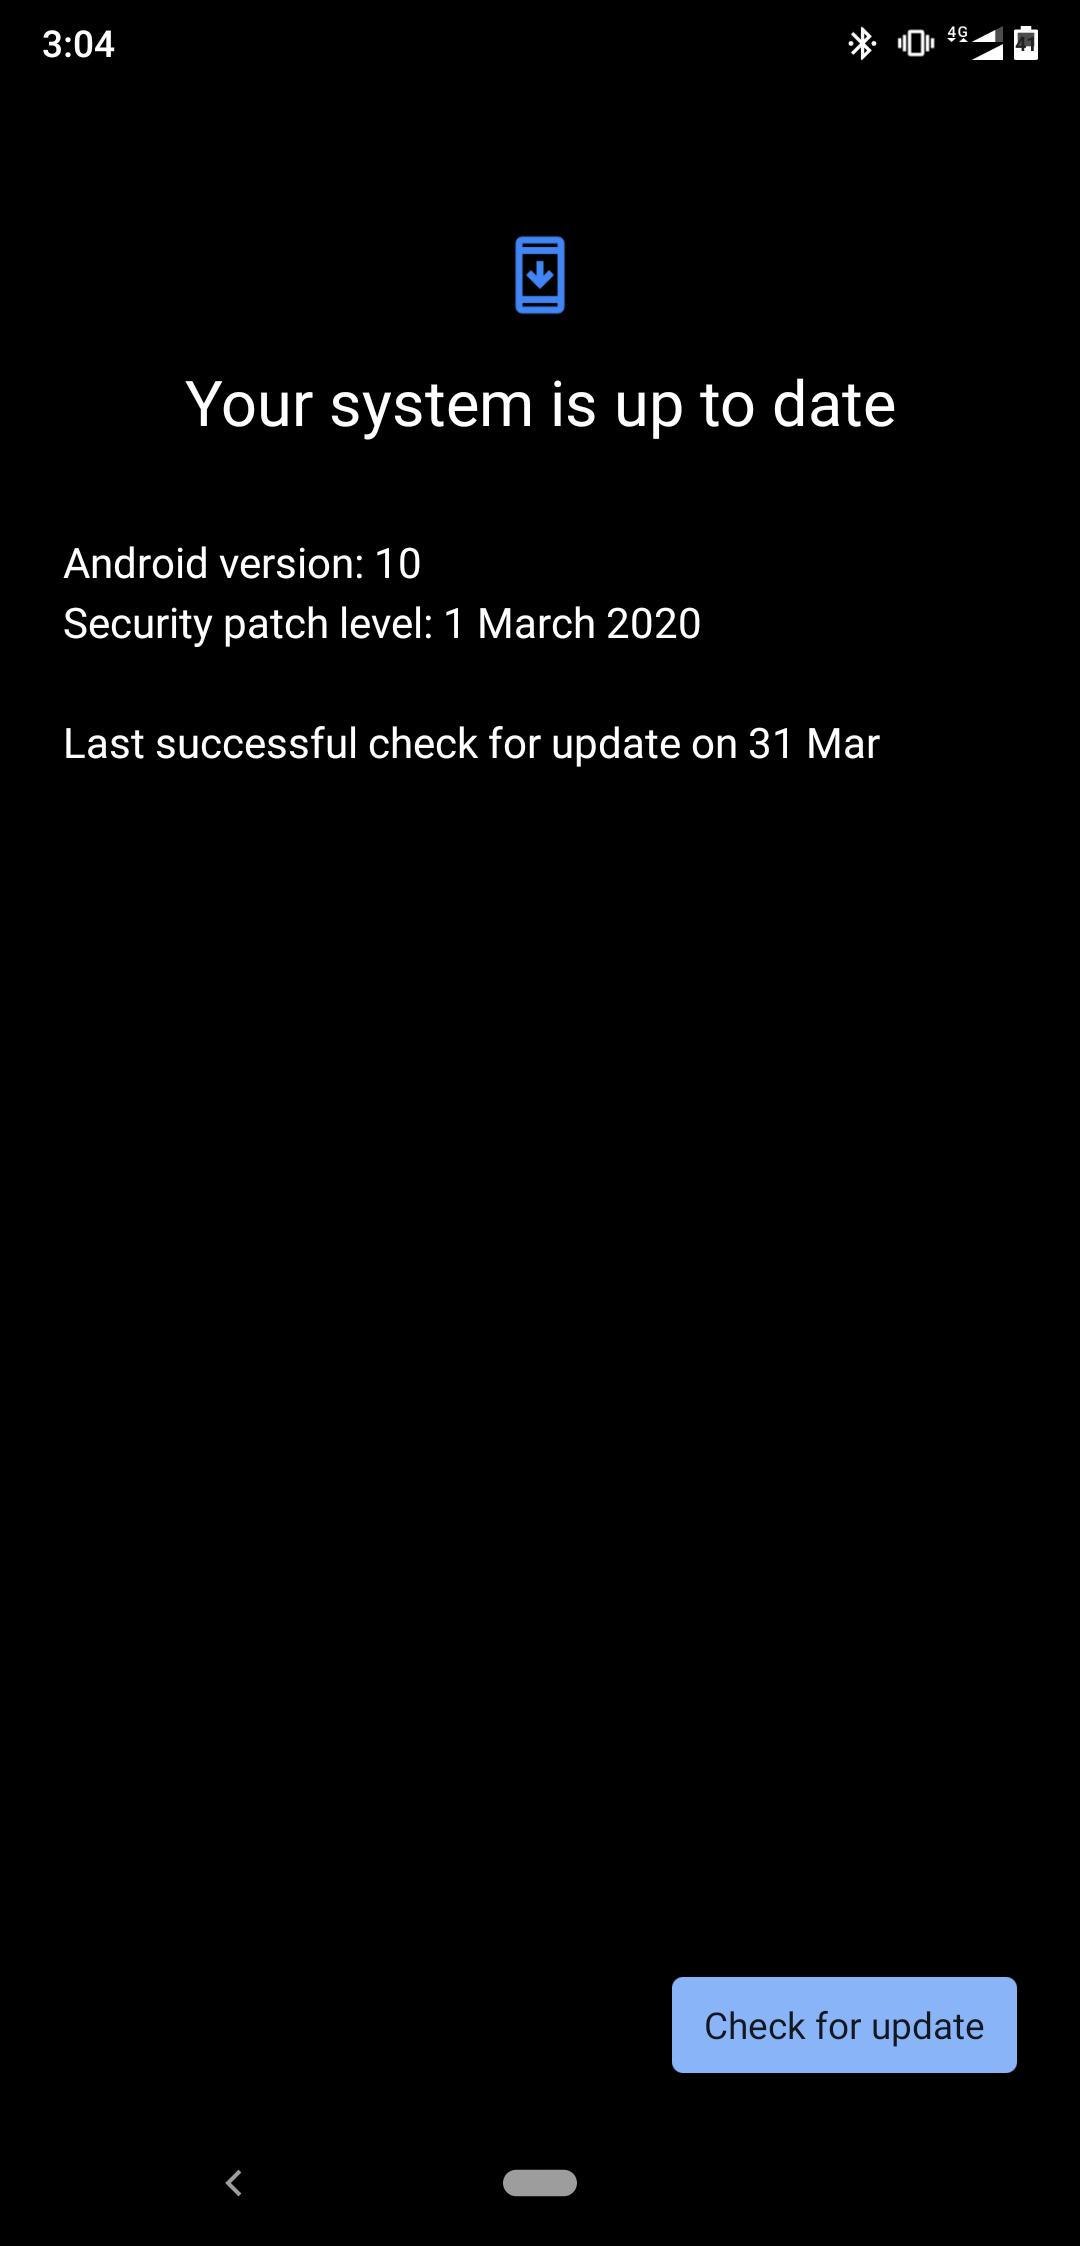 Screenshot_20200401-030437.png